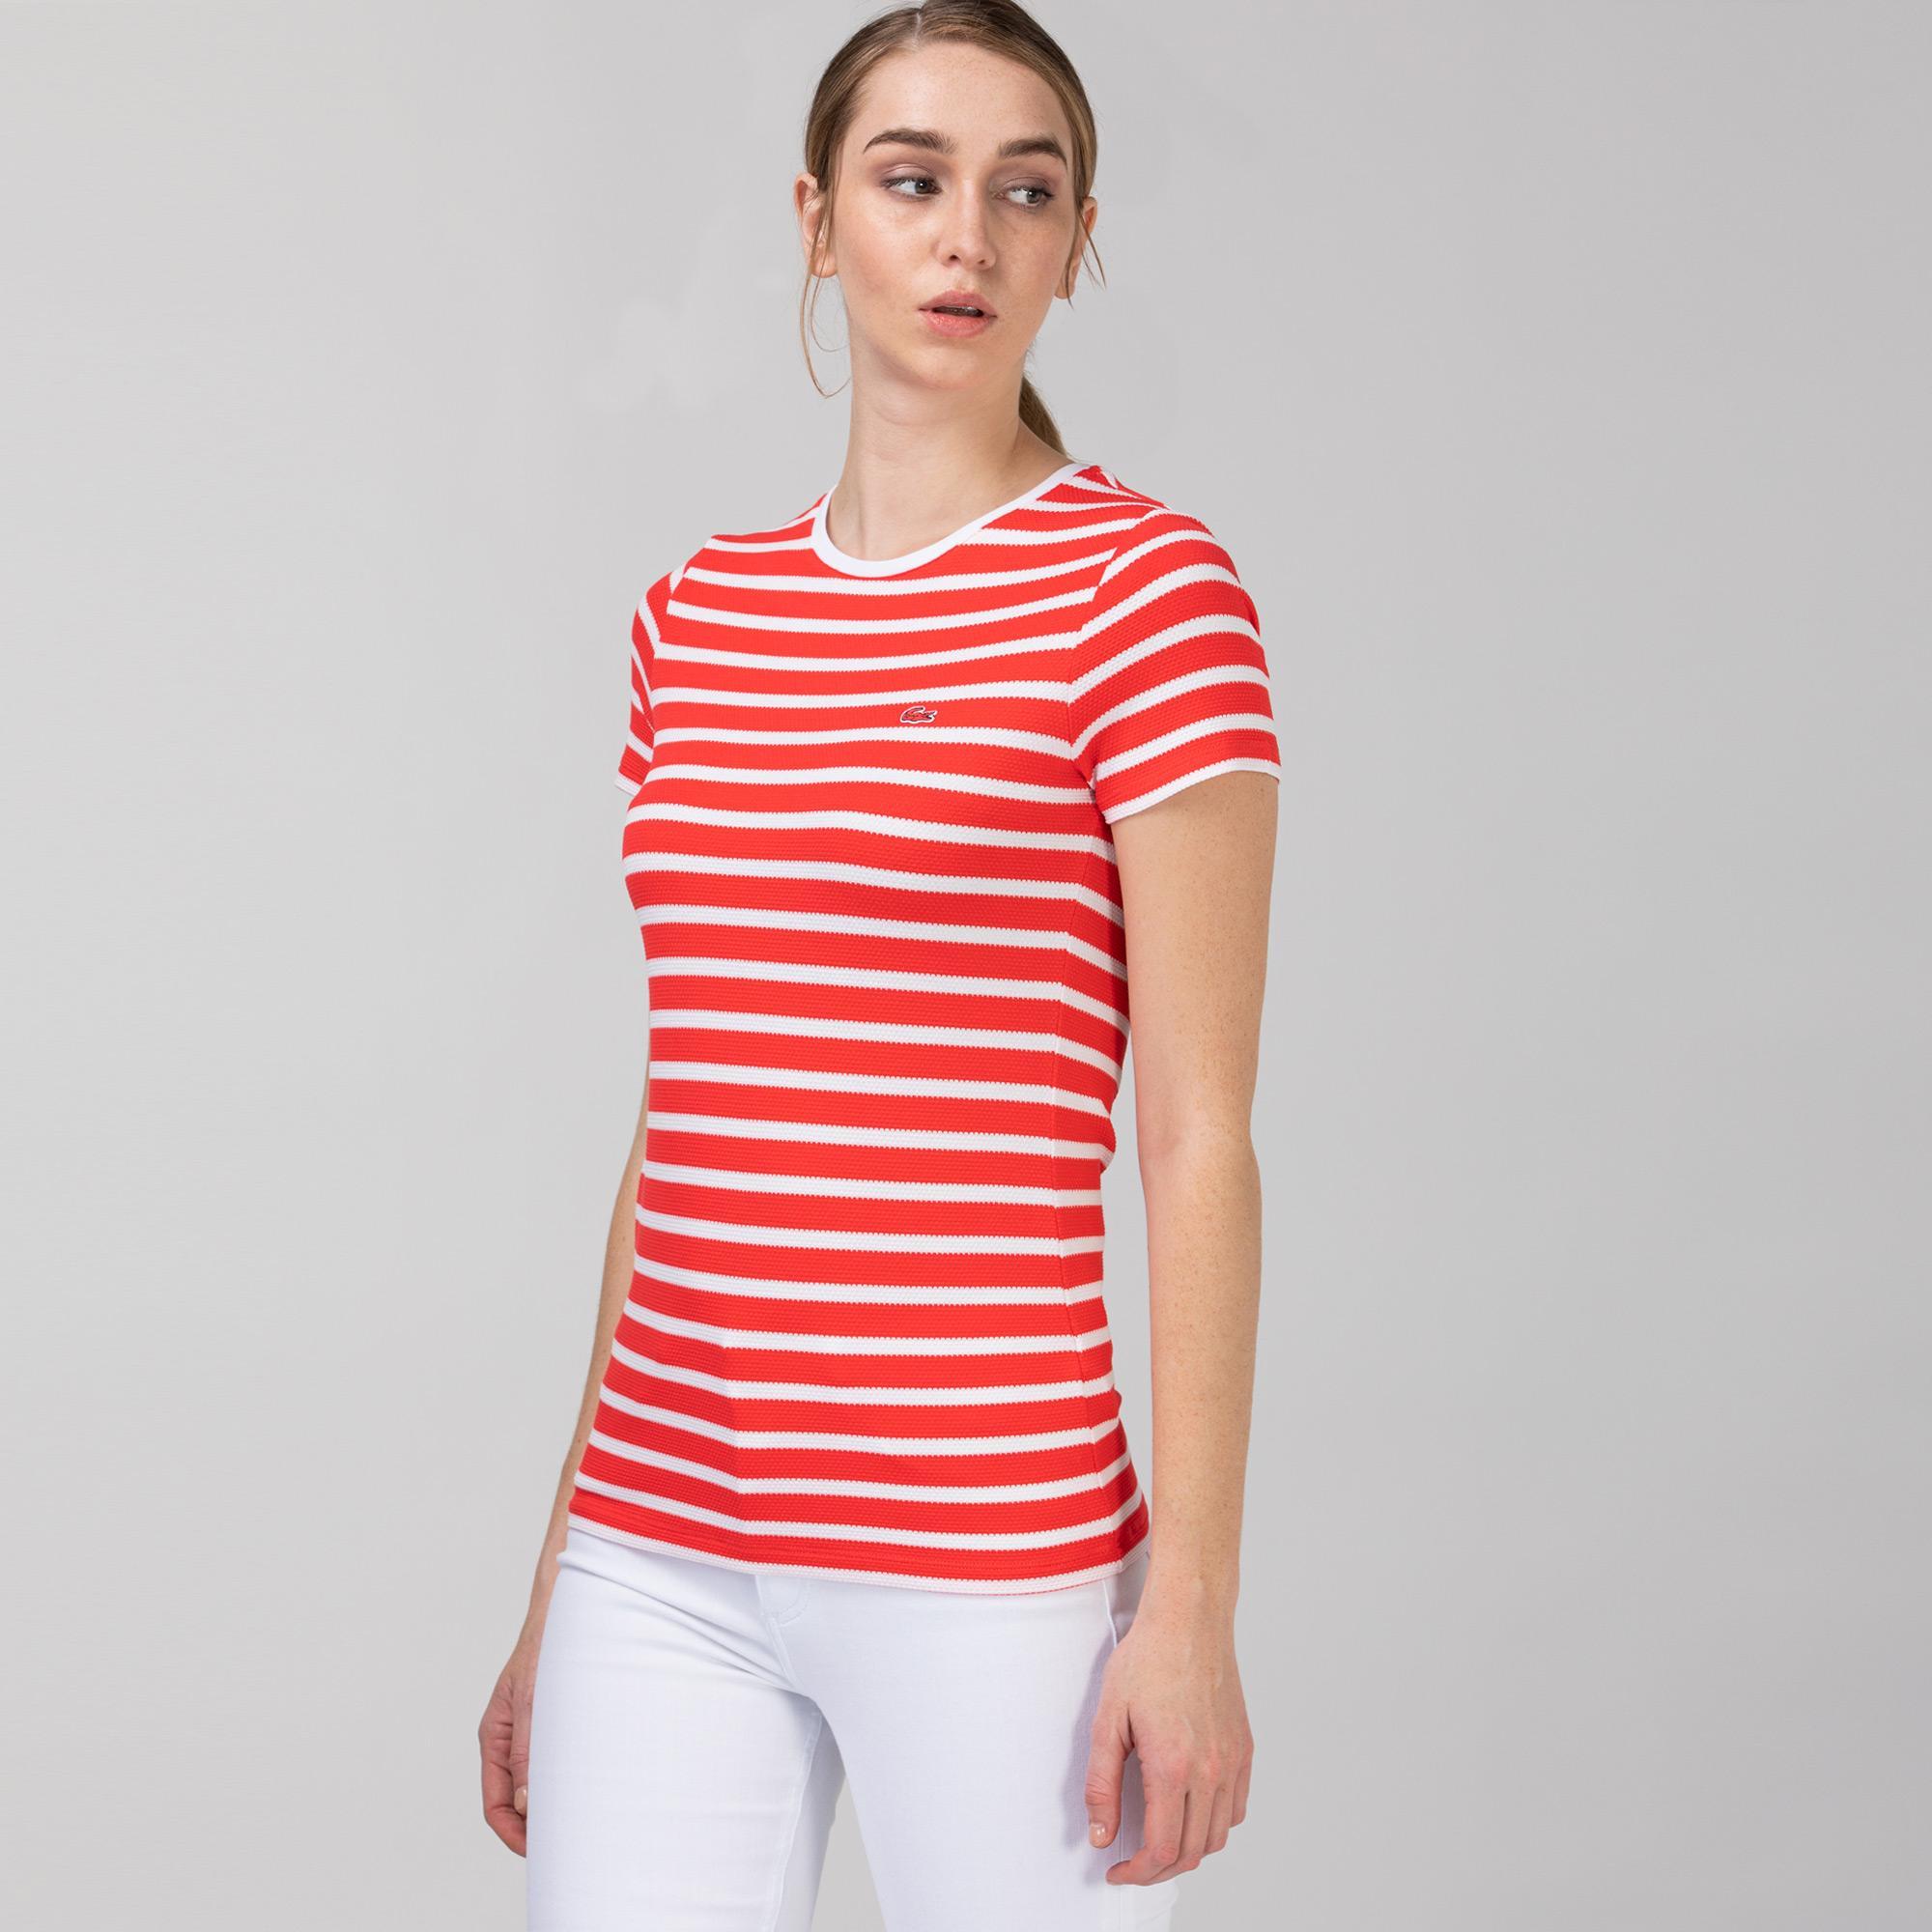 Lacoste Kadın Bisiklet Yaka Çizgili Pembe - Beyaz T-Shirt